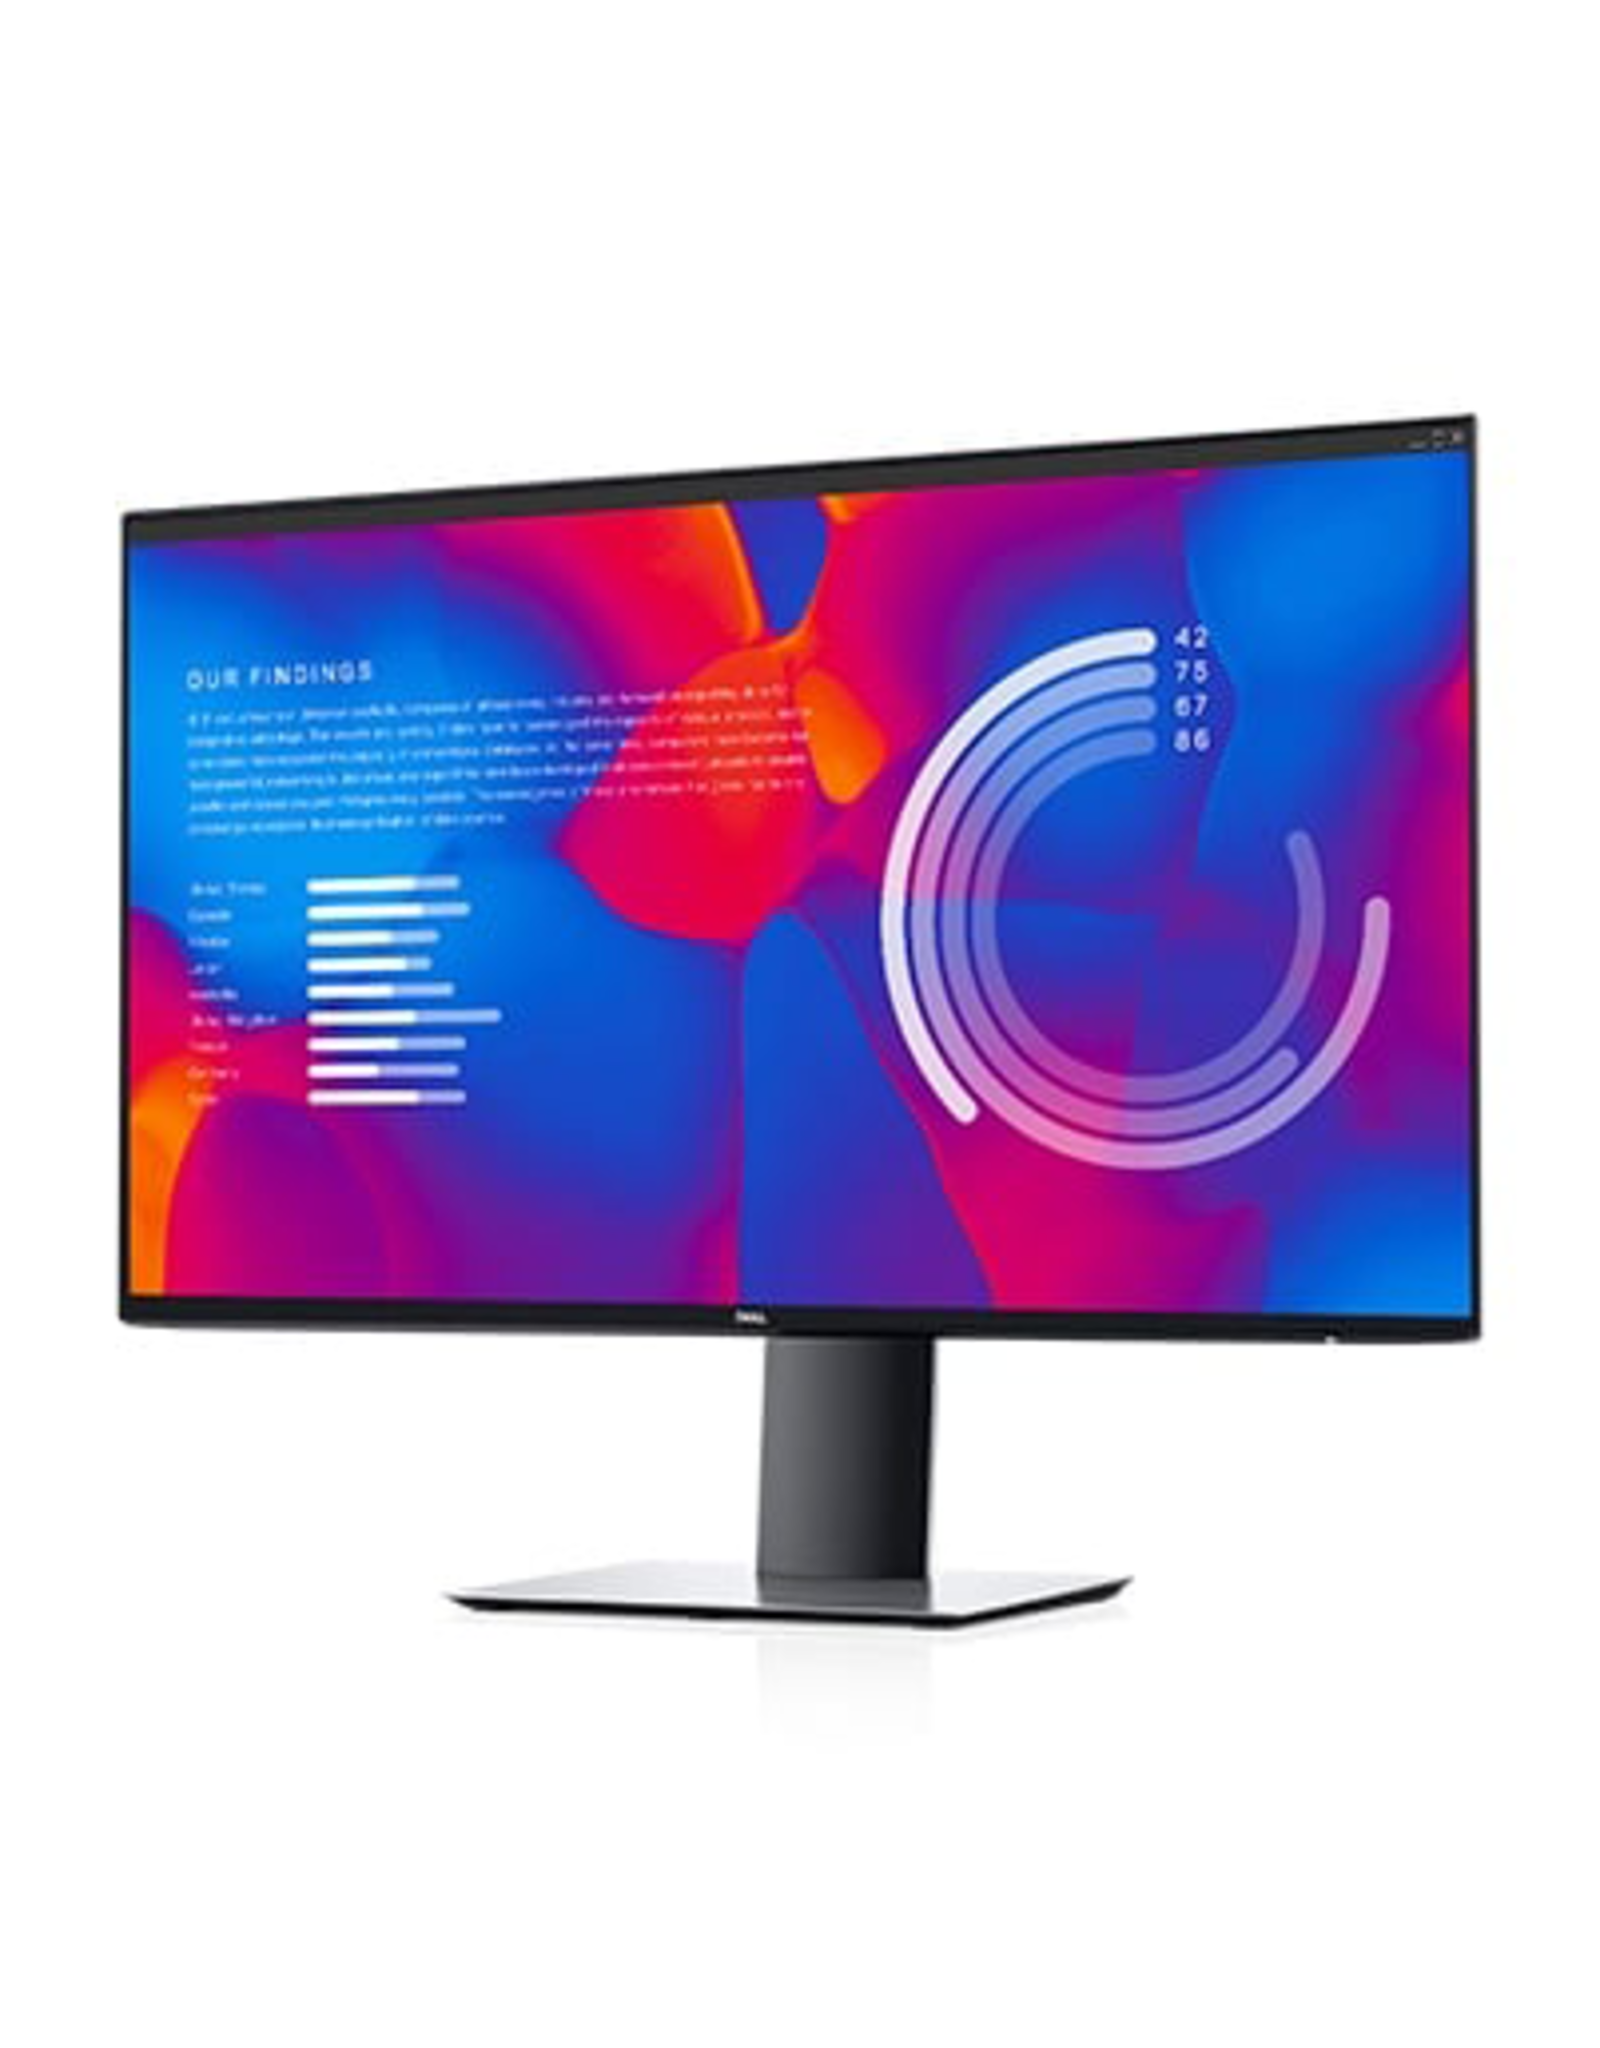 Dell DELL UltraSharp 27 USB-C Monitor 16:9 IPS 2560x1440 60HZ 8ms height adjustable tilt swivel pivot VESA mount 100x100 HDMI/DisplayPort/USB-C/USB 3.0